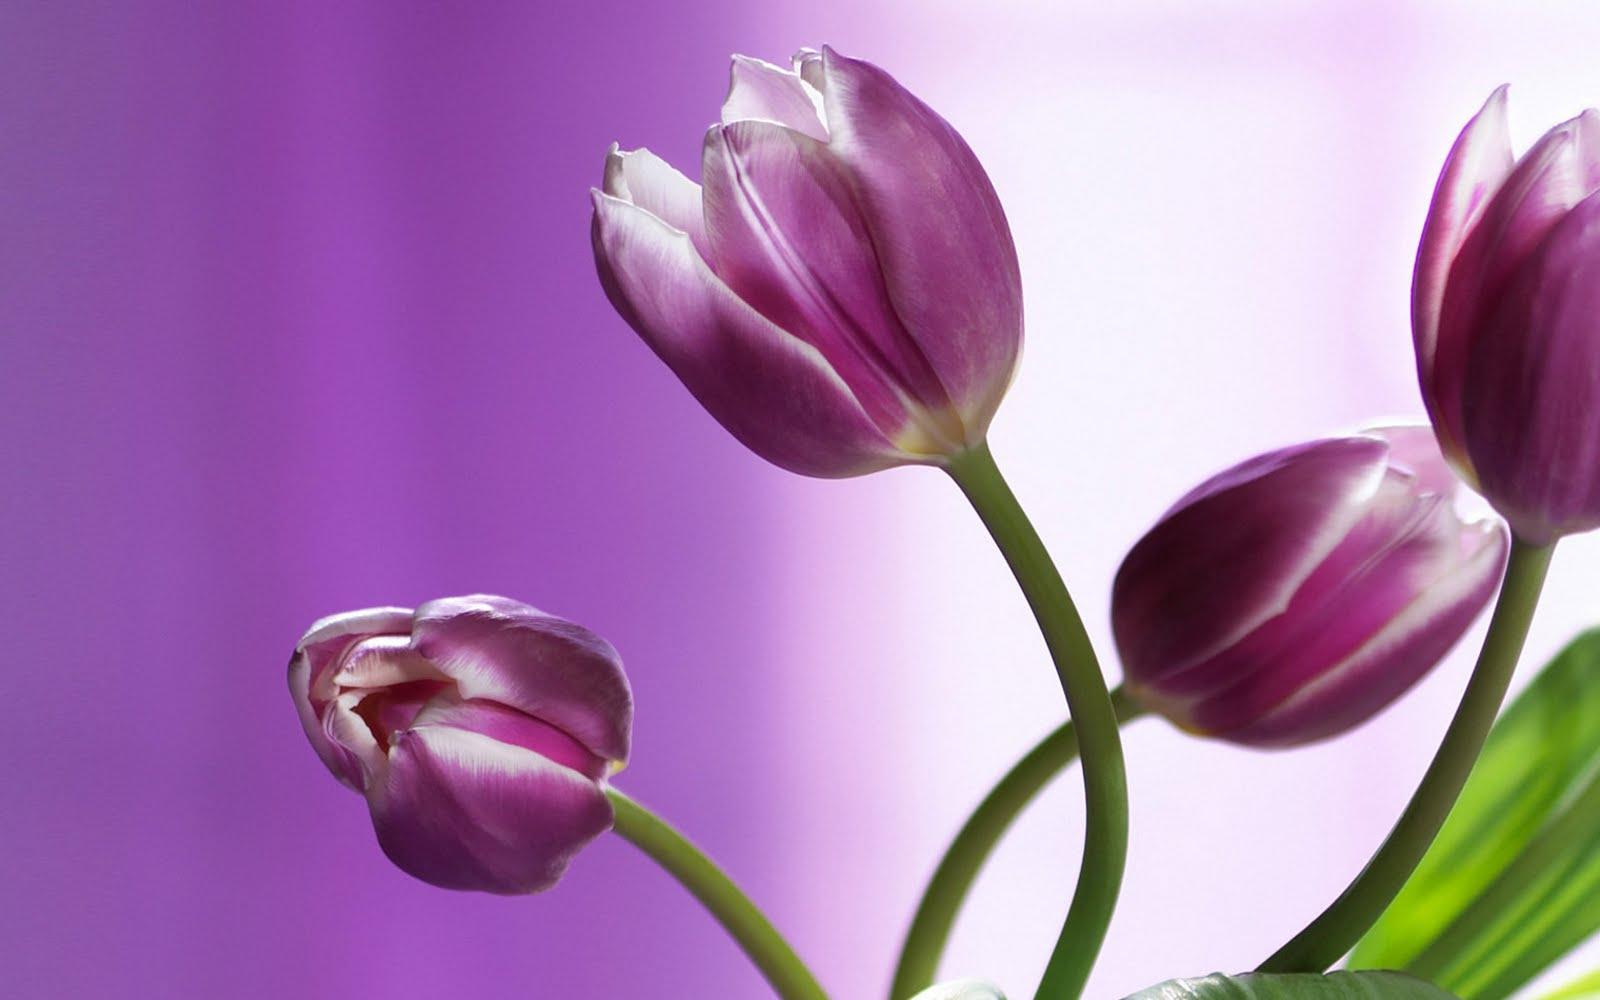 purple tulips hd wallpaper - photo #11